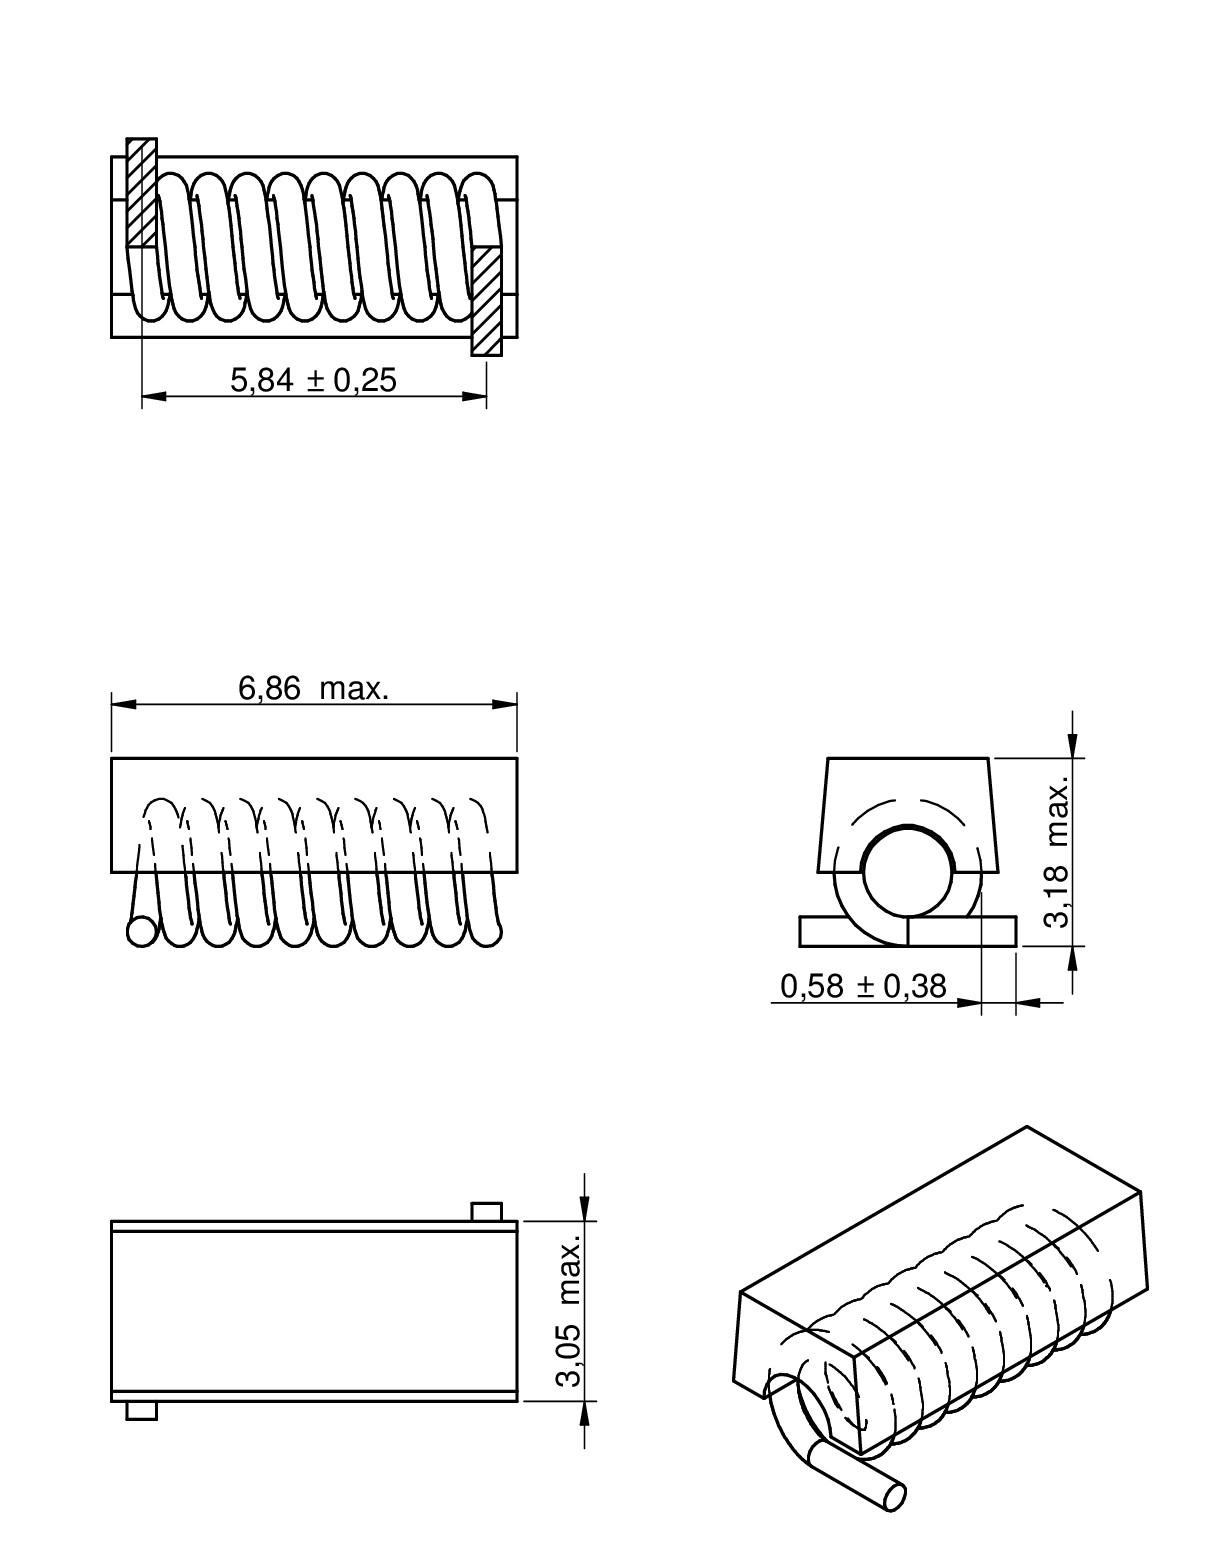 WE-CAIR Air coil | Passive Components | Würth Elektronik Standard Parts